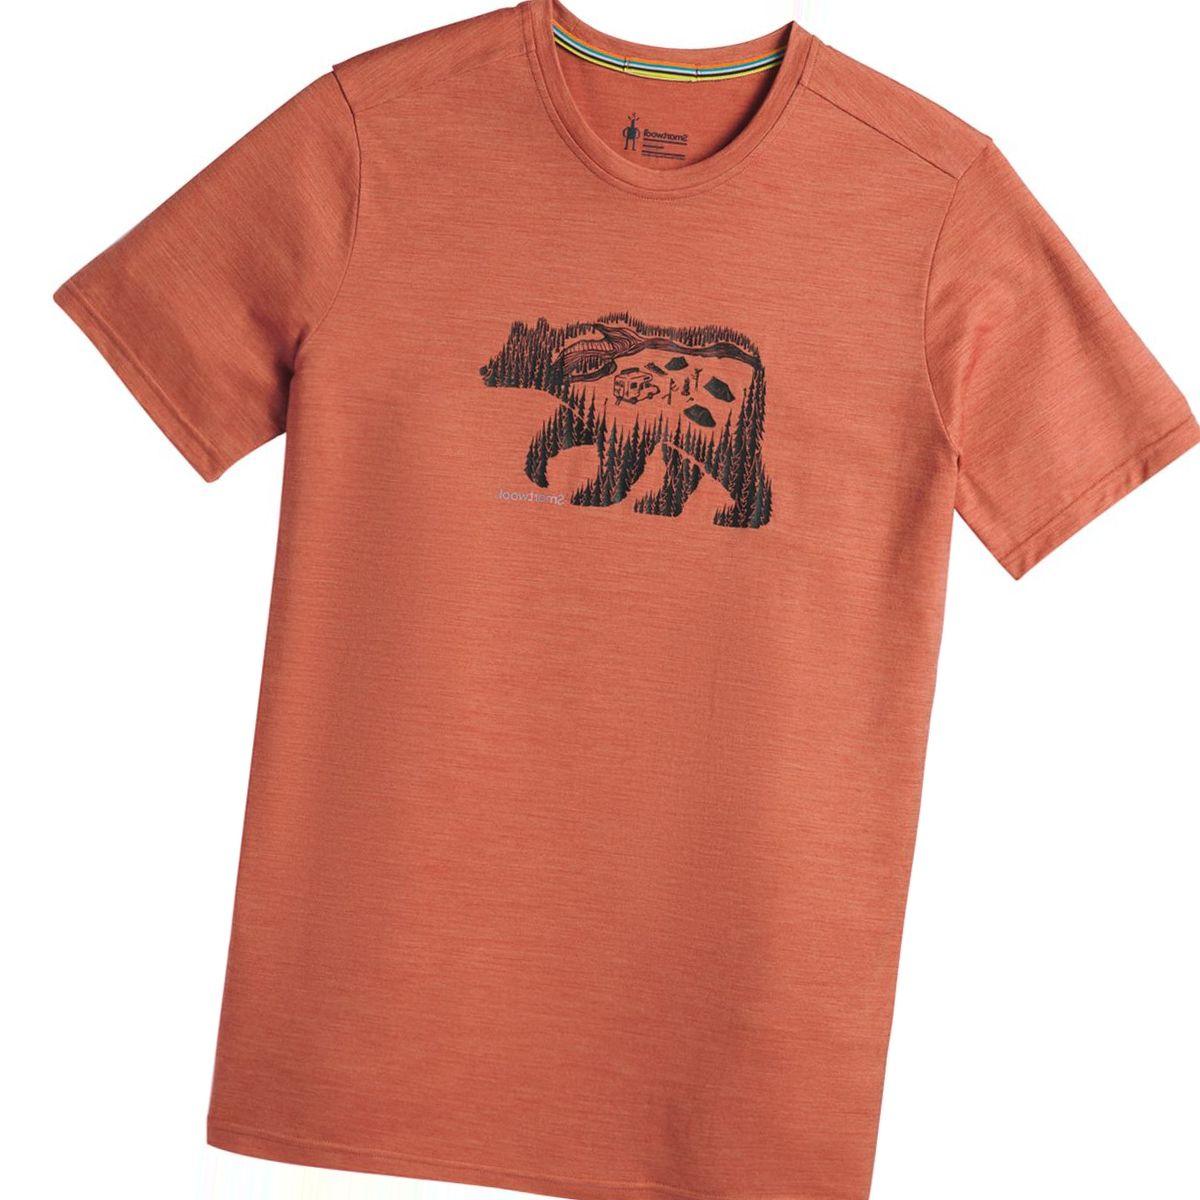 Smartwool Merino Sport 150 Bear Camp T-Shirt - Men's